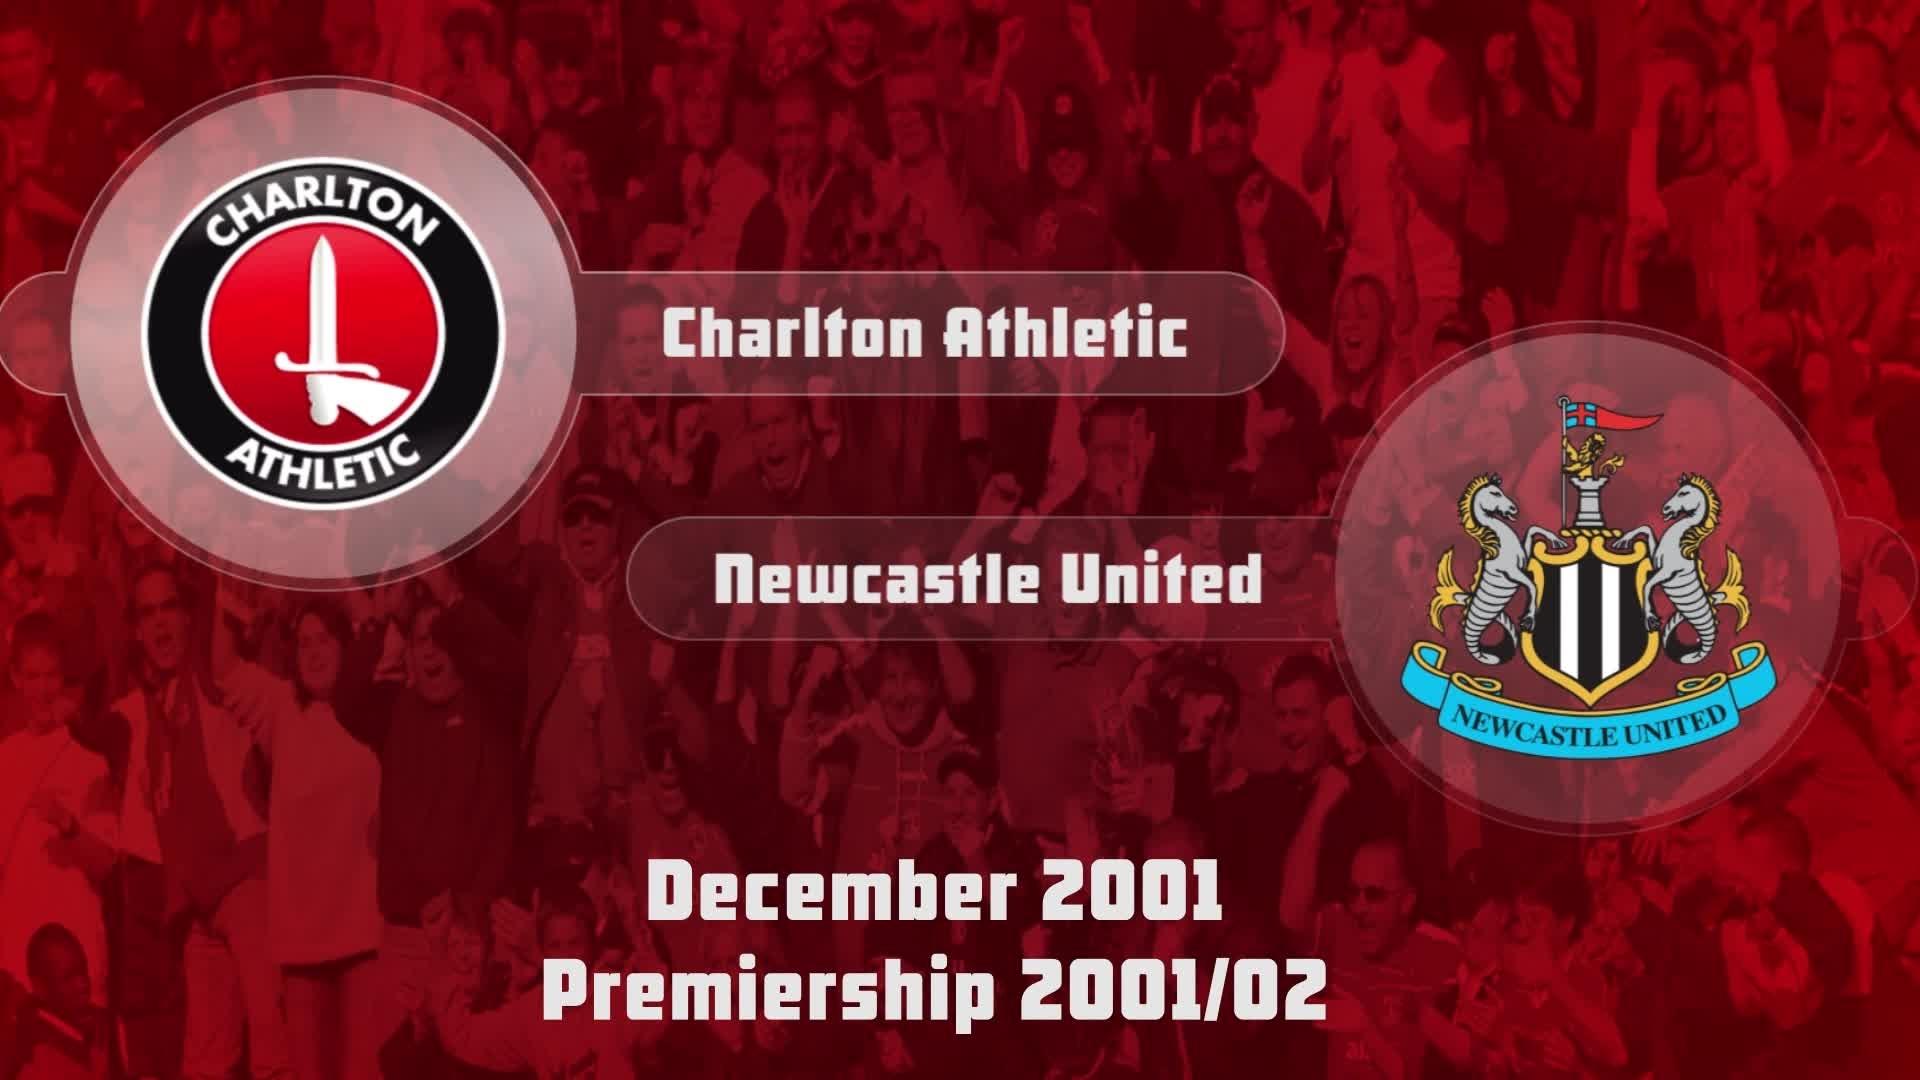 17 HIGHLIGHTS | Charlton 1 Newcastle 1 (Dec 2001)